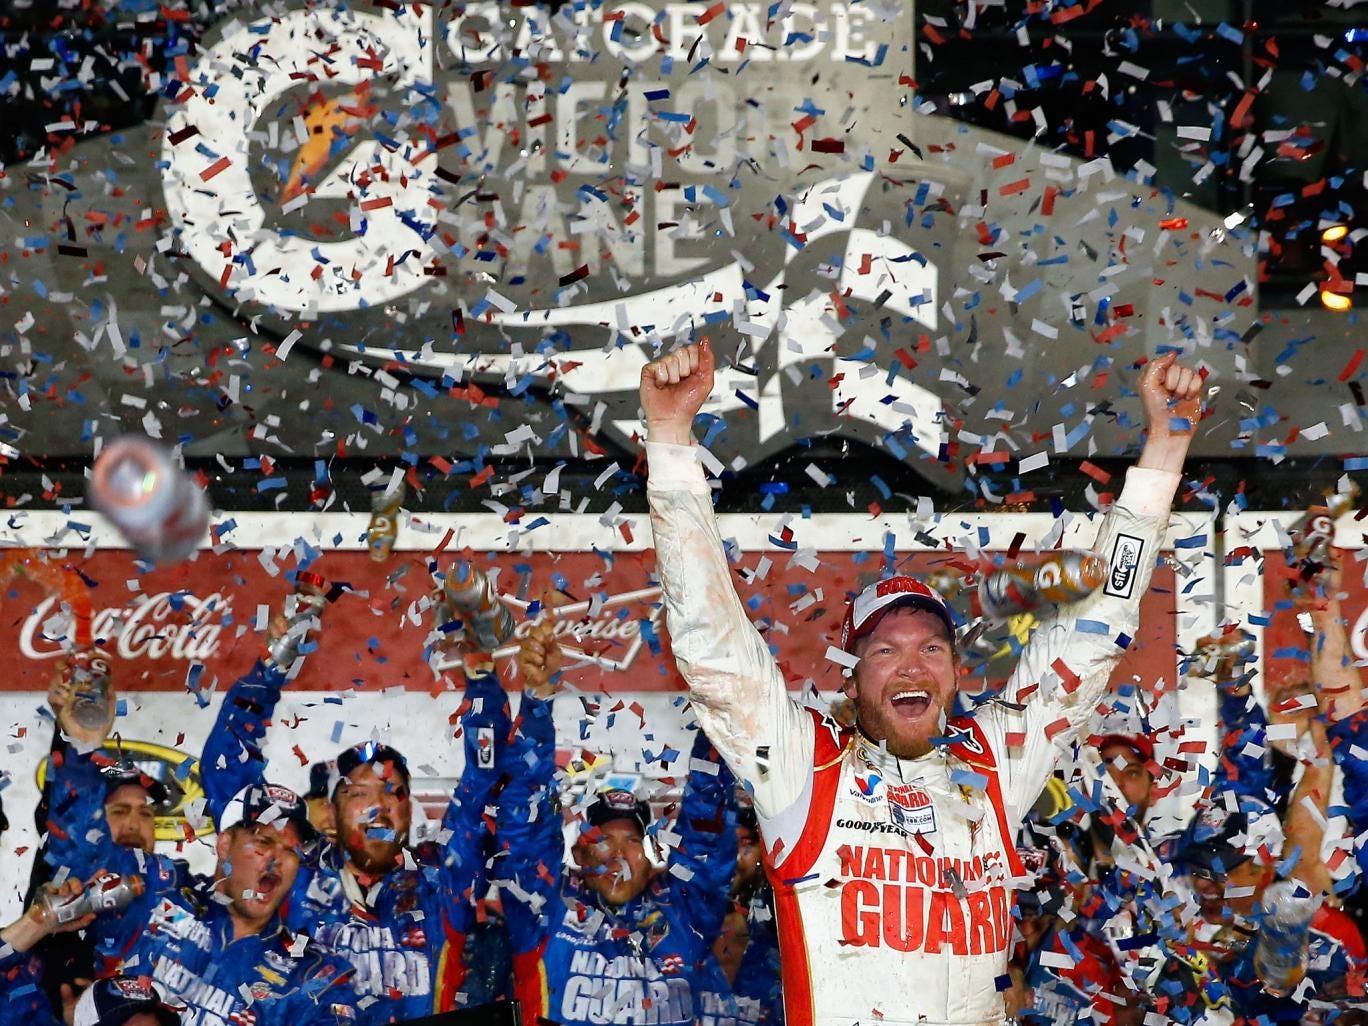 Dale Earnhardt Jr celebrates his success at the Nascar Sprint Cup season-opening Daytona 500